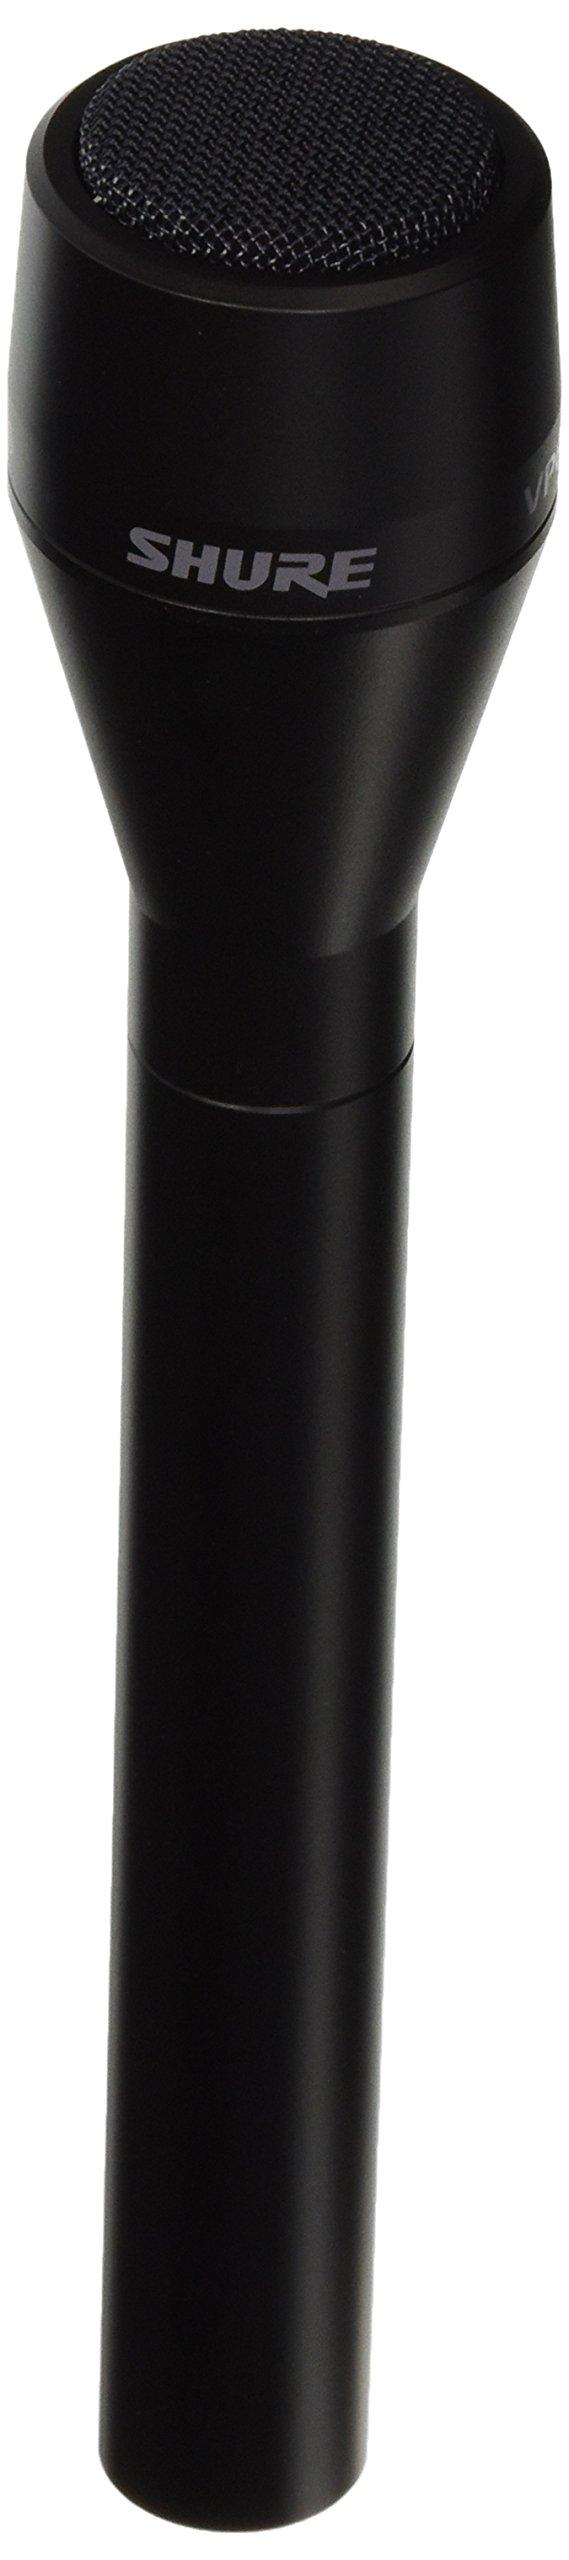 Microfono Shure VP64A Omnidirectional Handheld ...